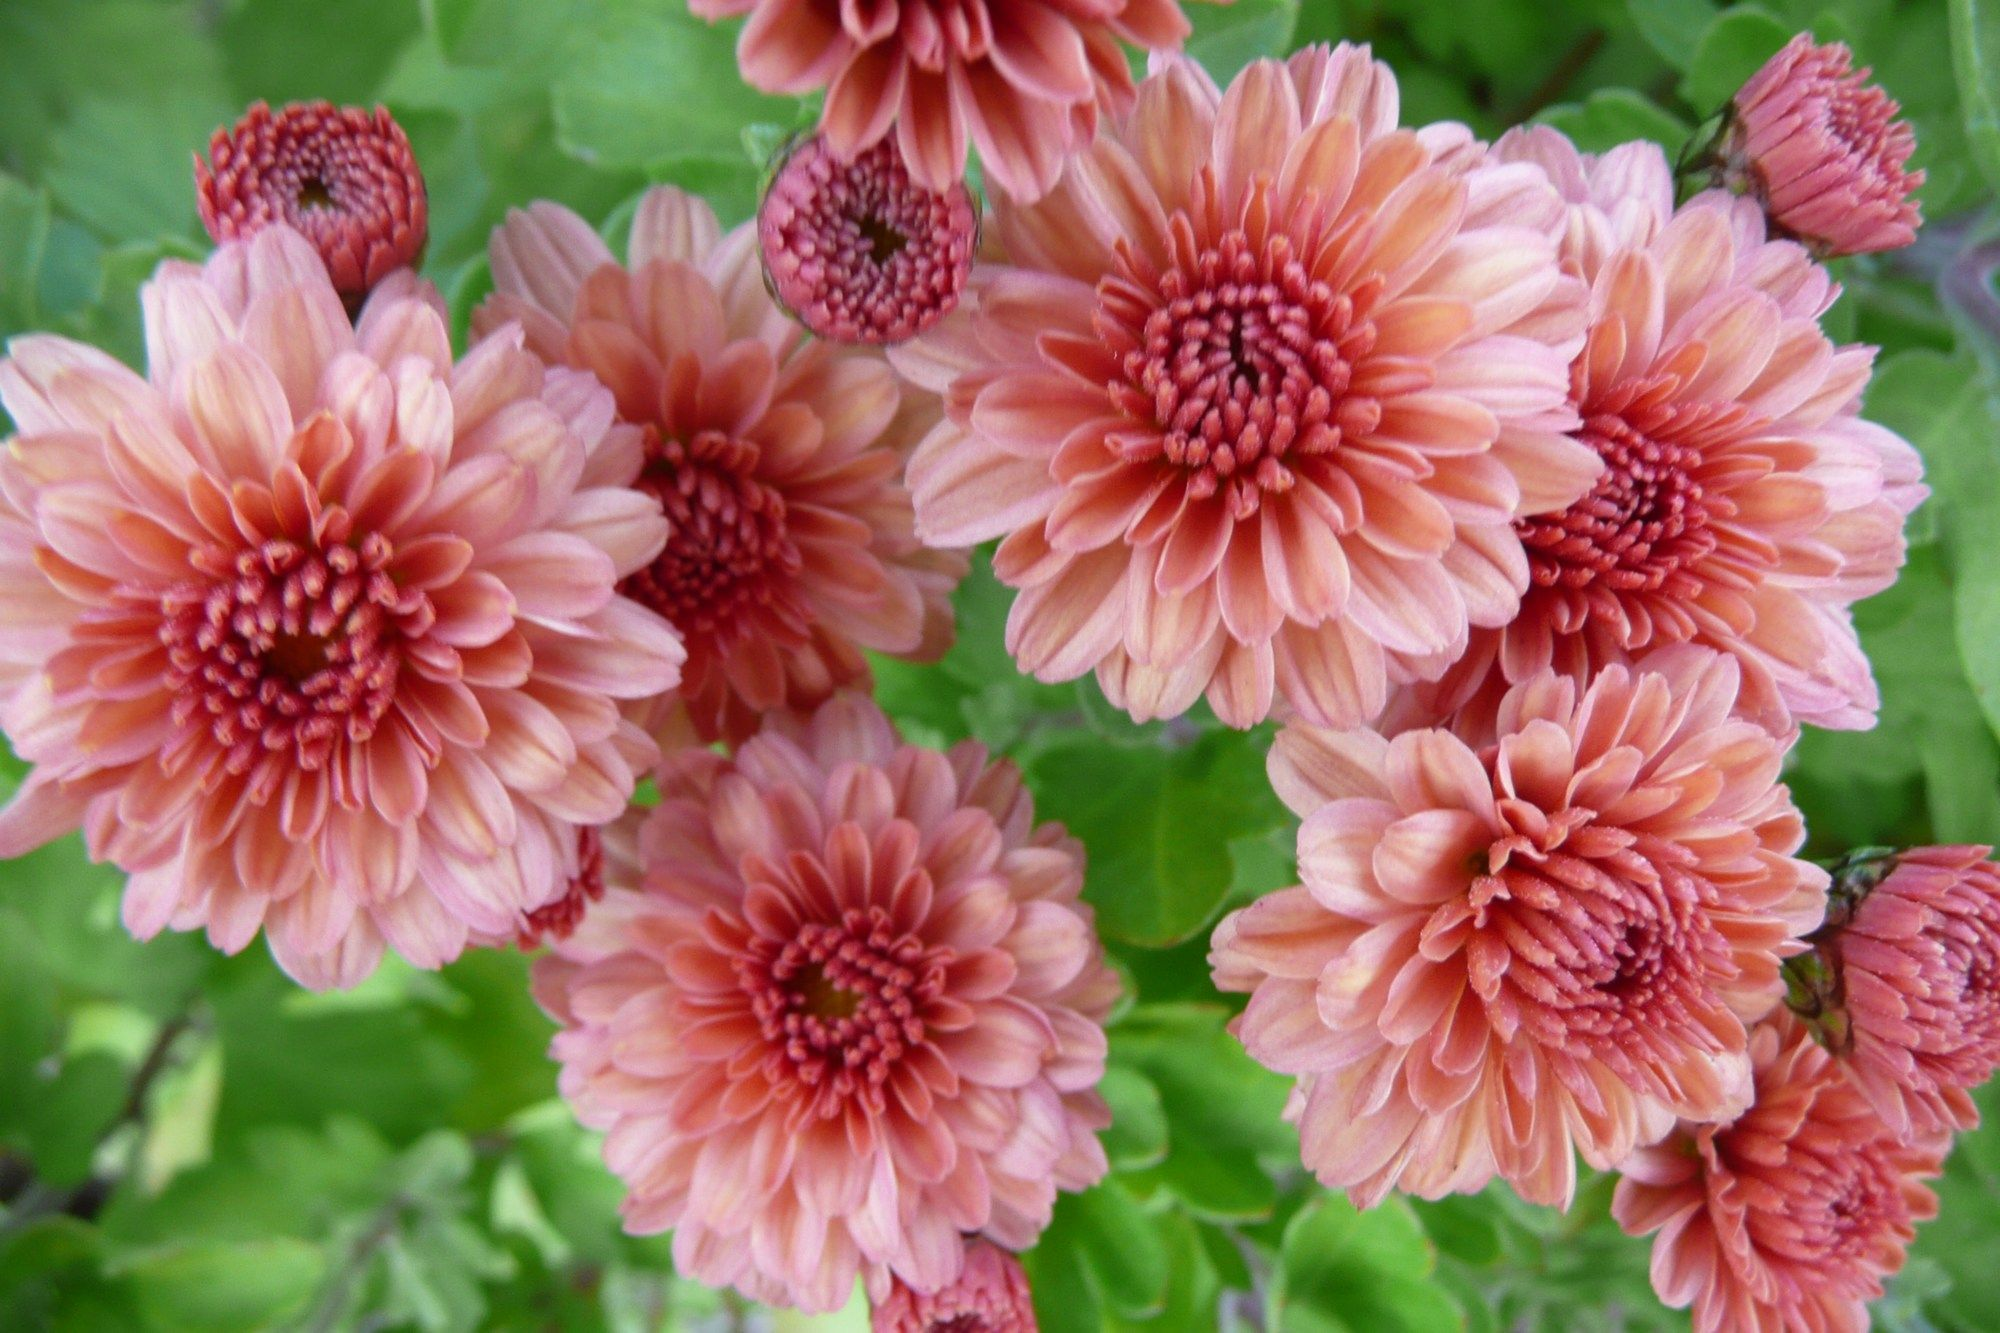 Chrysanthemum Flat Mums Flat Poms Spray Mums Floral